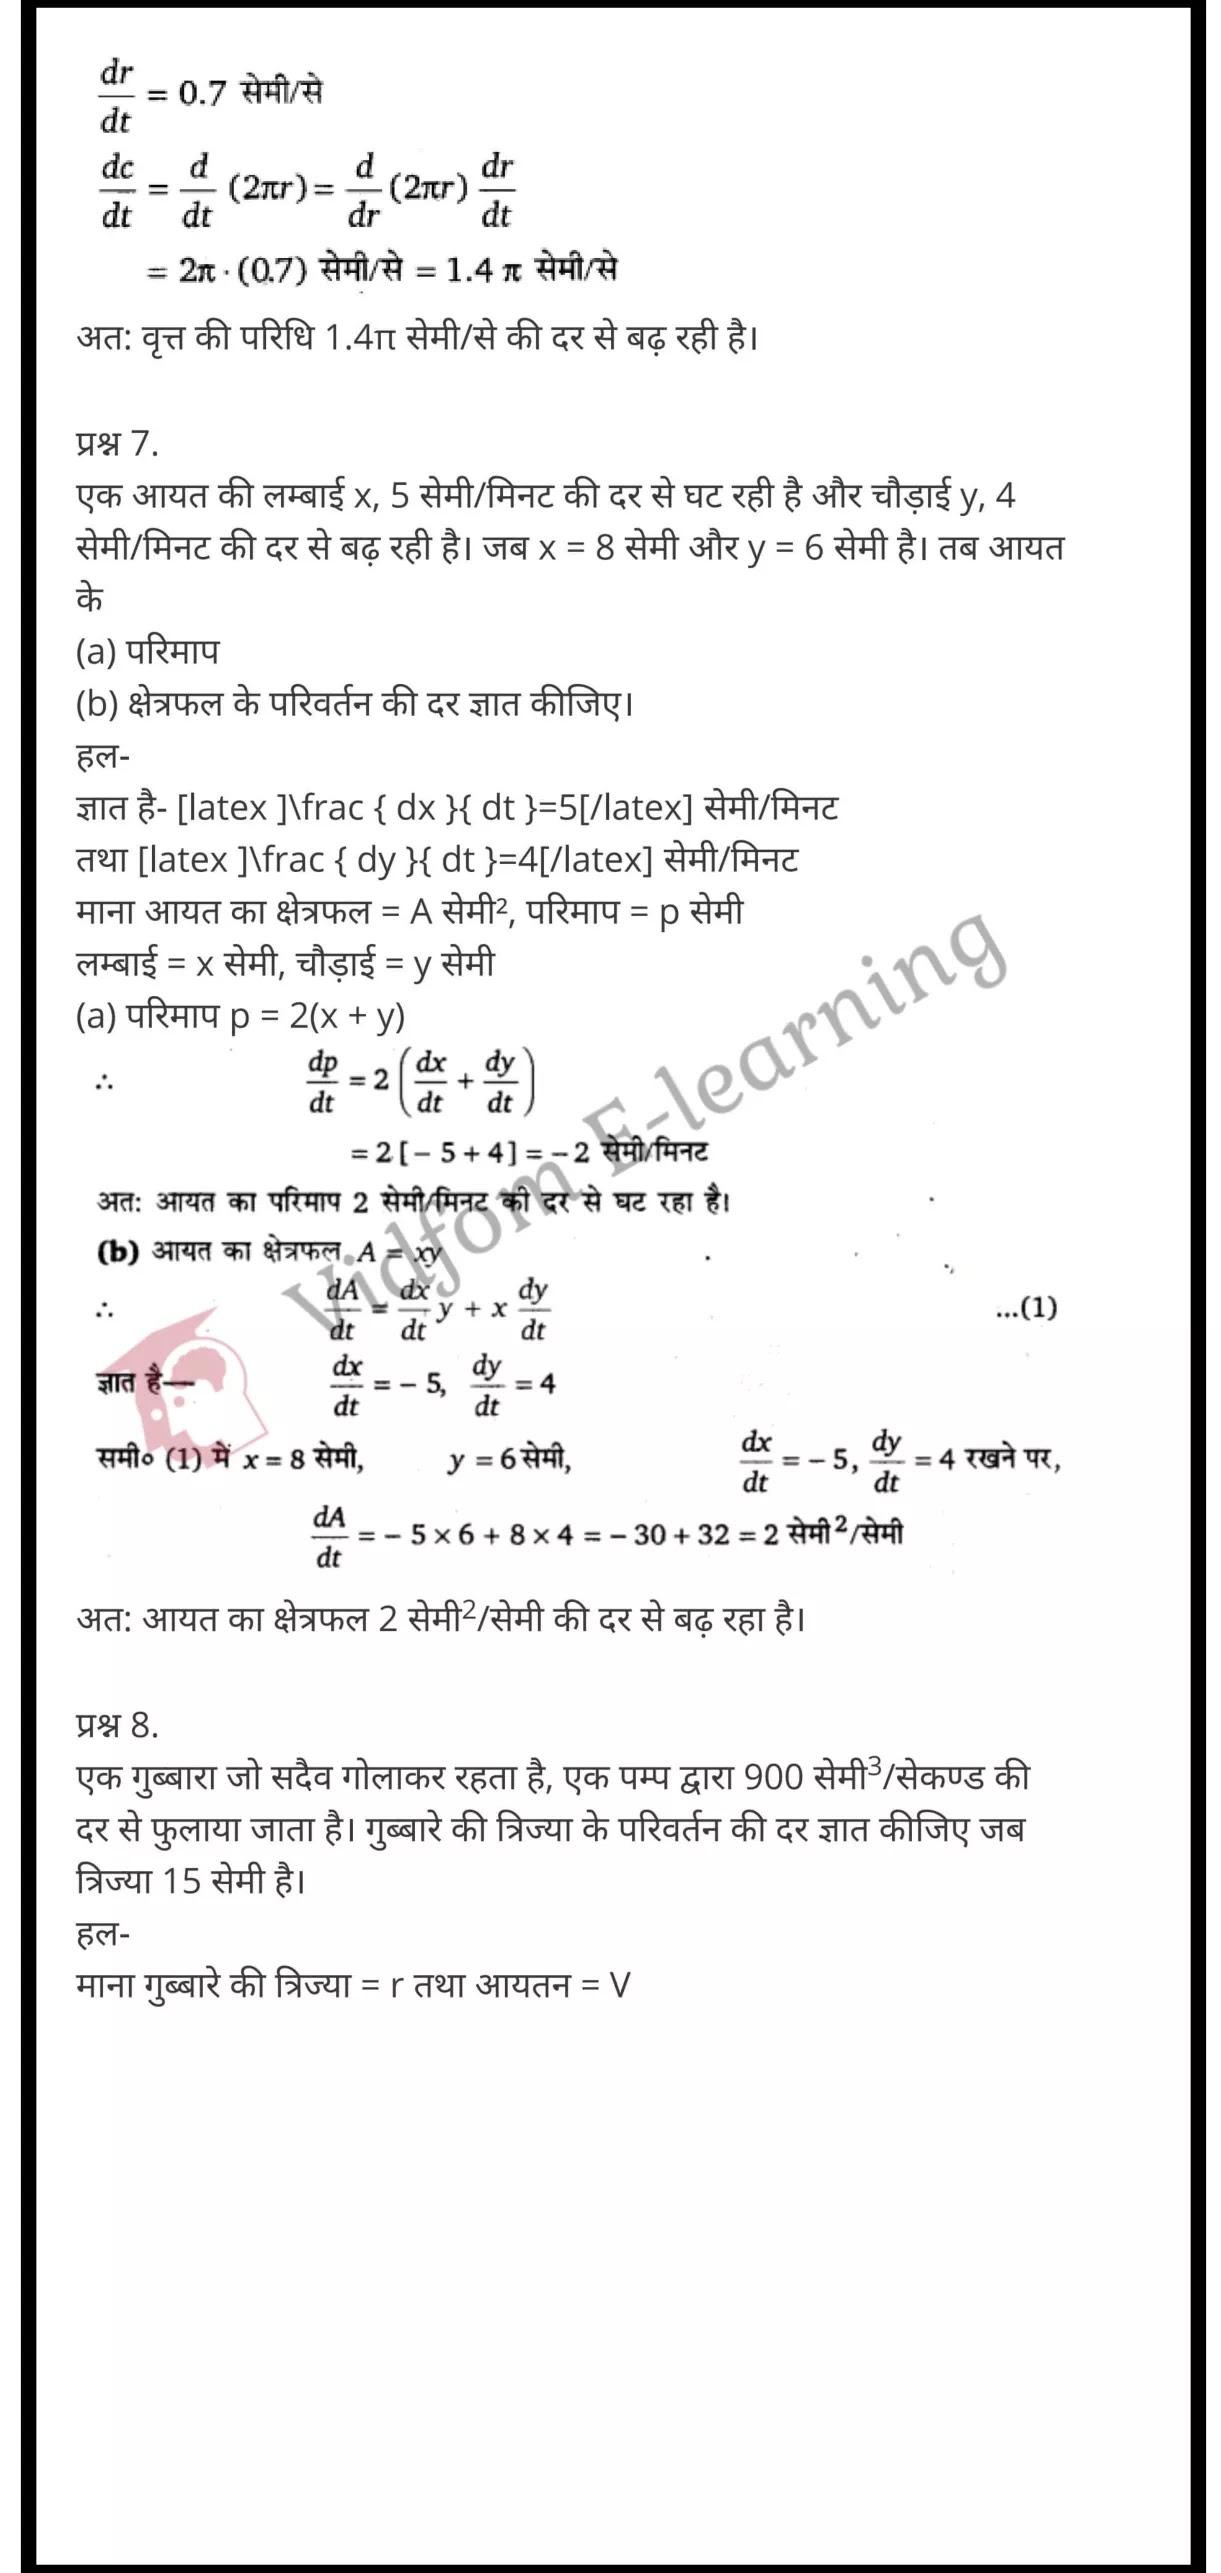 कक्षा 12 गणित  के नोट्स  हिंदी में एनसीईआरटी समाधान,     class 12 Maths Chapter 6,   class 12 Maths Chapter 6 ncert solutions in Hindi,   class 12 Maths Chapter 6 notes in hindi,   class 12 Maths Chapter 6 question answer,   class 12 Maths Chapter 6 notes,   class 12 Maths Chapter 6 class 12 Maths Chapter 6 in  hindi,    class 12 Maths Chapter 6 important questions in  hindi,   class 12 Maths Chapter 6 notes in hindi,    class 12 Maths Chapter 6 test,   class 12 Maths Chapter 6 pdf,   class 12 Maths Chapter 6 notes pdf,   class 12 Maths Chapter 6 exercise solutions,   class 12 Maths Chapter 6 notes study rankers,   class 12 Maths Chapter 6 notes,    class 12 Maths Chapter 6  class 12  notes pdf,   class 12 Maths Chapter 6 class 12  notes  ncert,   class 12 Maths Chapter 6 class 12 pdf,   class 12 Maths Chapter 6  book,   class 12 Maths Chapter 6 quiz class 12  ,    10  th class 12 Maths Chapter 6  book up board,   up board 10  th class 12 Maths Chapter 6 notes,  class 12 Maths,   class 12 Maths ncert solutions in Hindi,   class 12 Maths notes in hindi,   class 12 Maths question answer,   class 12 Maths notes,  class 12 Maths class 12 Maths Chapter 6 in  hindi,    class 12 Maths important questions in  hindi,   class 12 Maths notes in hindi,    class 12 Maths test,  class 12 Maths class 12 Maths Chapter 6 pdf,   class 12 Maths notes pdf,   class 12 Maths exercise solutions,   class 12 Maths,  class 12 Maths notes study rankers,   class 12 Maths notes,  class 12 Maths notes,   class 12 Maths  class 12  notes pdf,   class 12 Maths class 12  notes  ncert,   class 12 Maths class 12 pdf,   class 12 Maths  book,  class 12 Maths quiz class 12  ,  10  th class 12 Maths    book up board,    up board 10  th class 12 Maths notes,      कक्षा 12 गणित अध्याय 6 ,  कक्षा 12 गणित, कक्षा 12 गणित अध्याय 6  के नोट्स हिंदी में,  कक्षा 12 का हिंदी अध्याय 6 का प्रश्न उत्तर,  कक्षा 12 गणित अध्याय 6 के नोट्स,  10 कक्षा गणित  हिंदी में, कक्षा 12 गणित अध्याय 6  हिंदी में,  कक्षा 12 गणित अध्याय